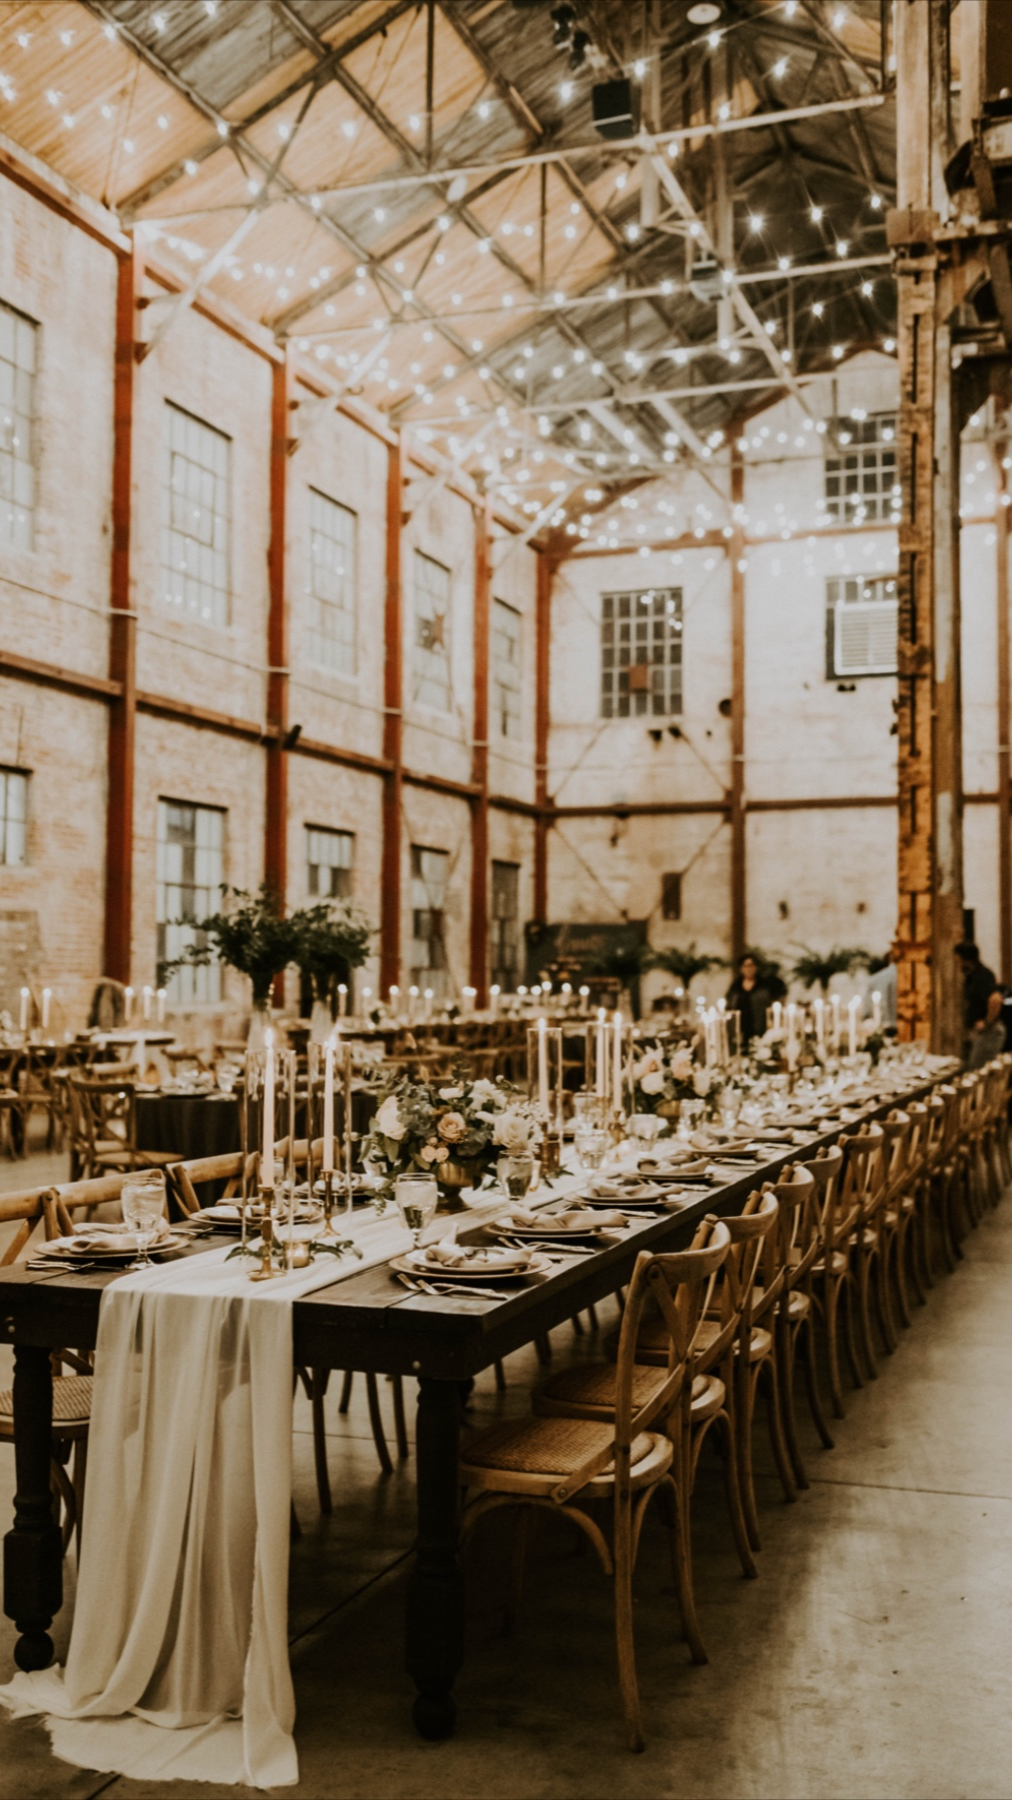 Romantic Wedding Decor - Kayla Esparza Photography